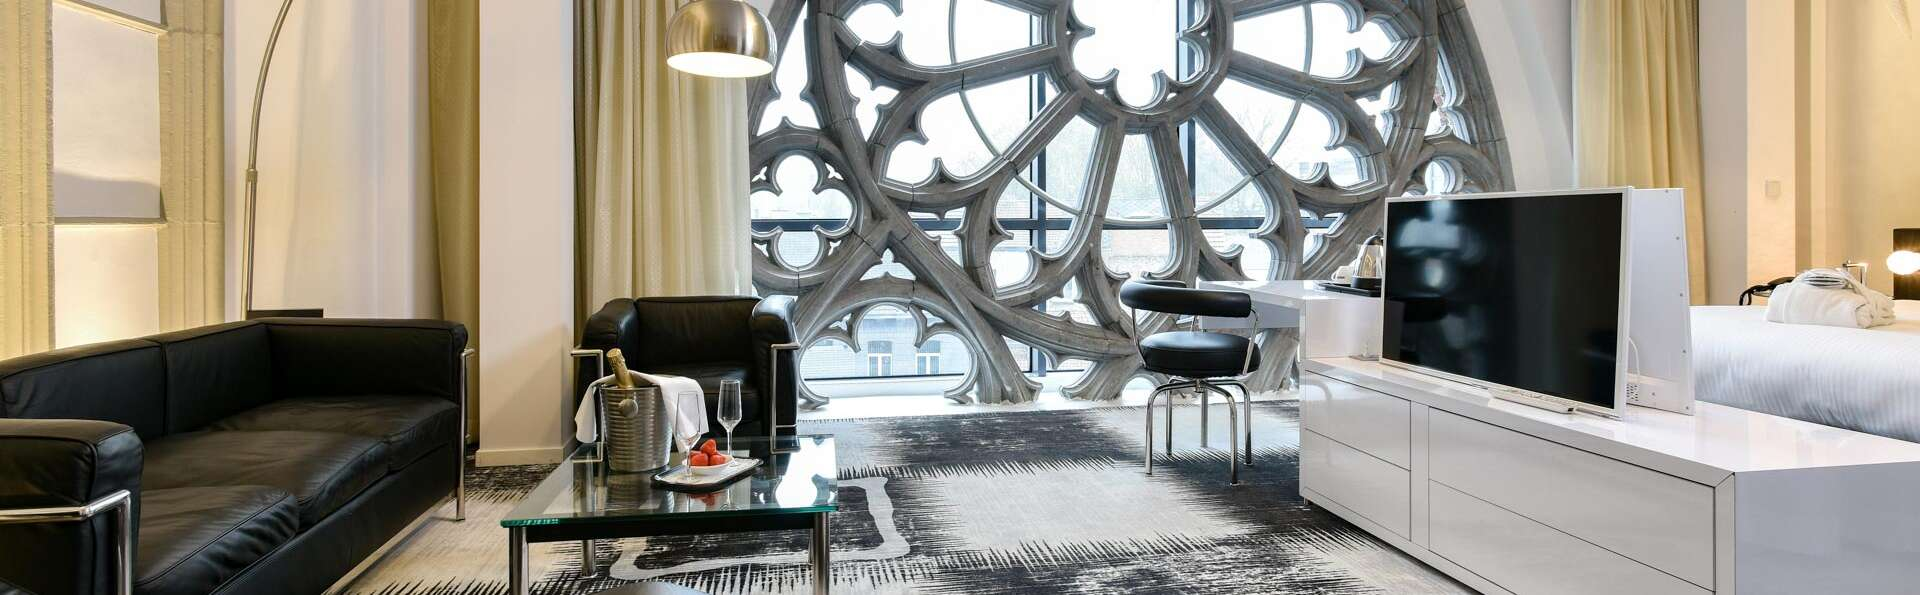 Martin's Dream Hotel - EDIT_NEW_ROOM_37.jpg